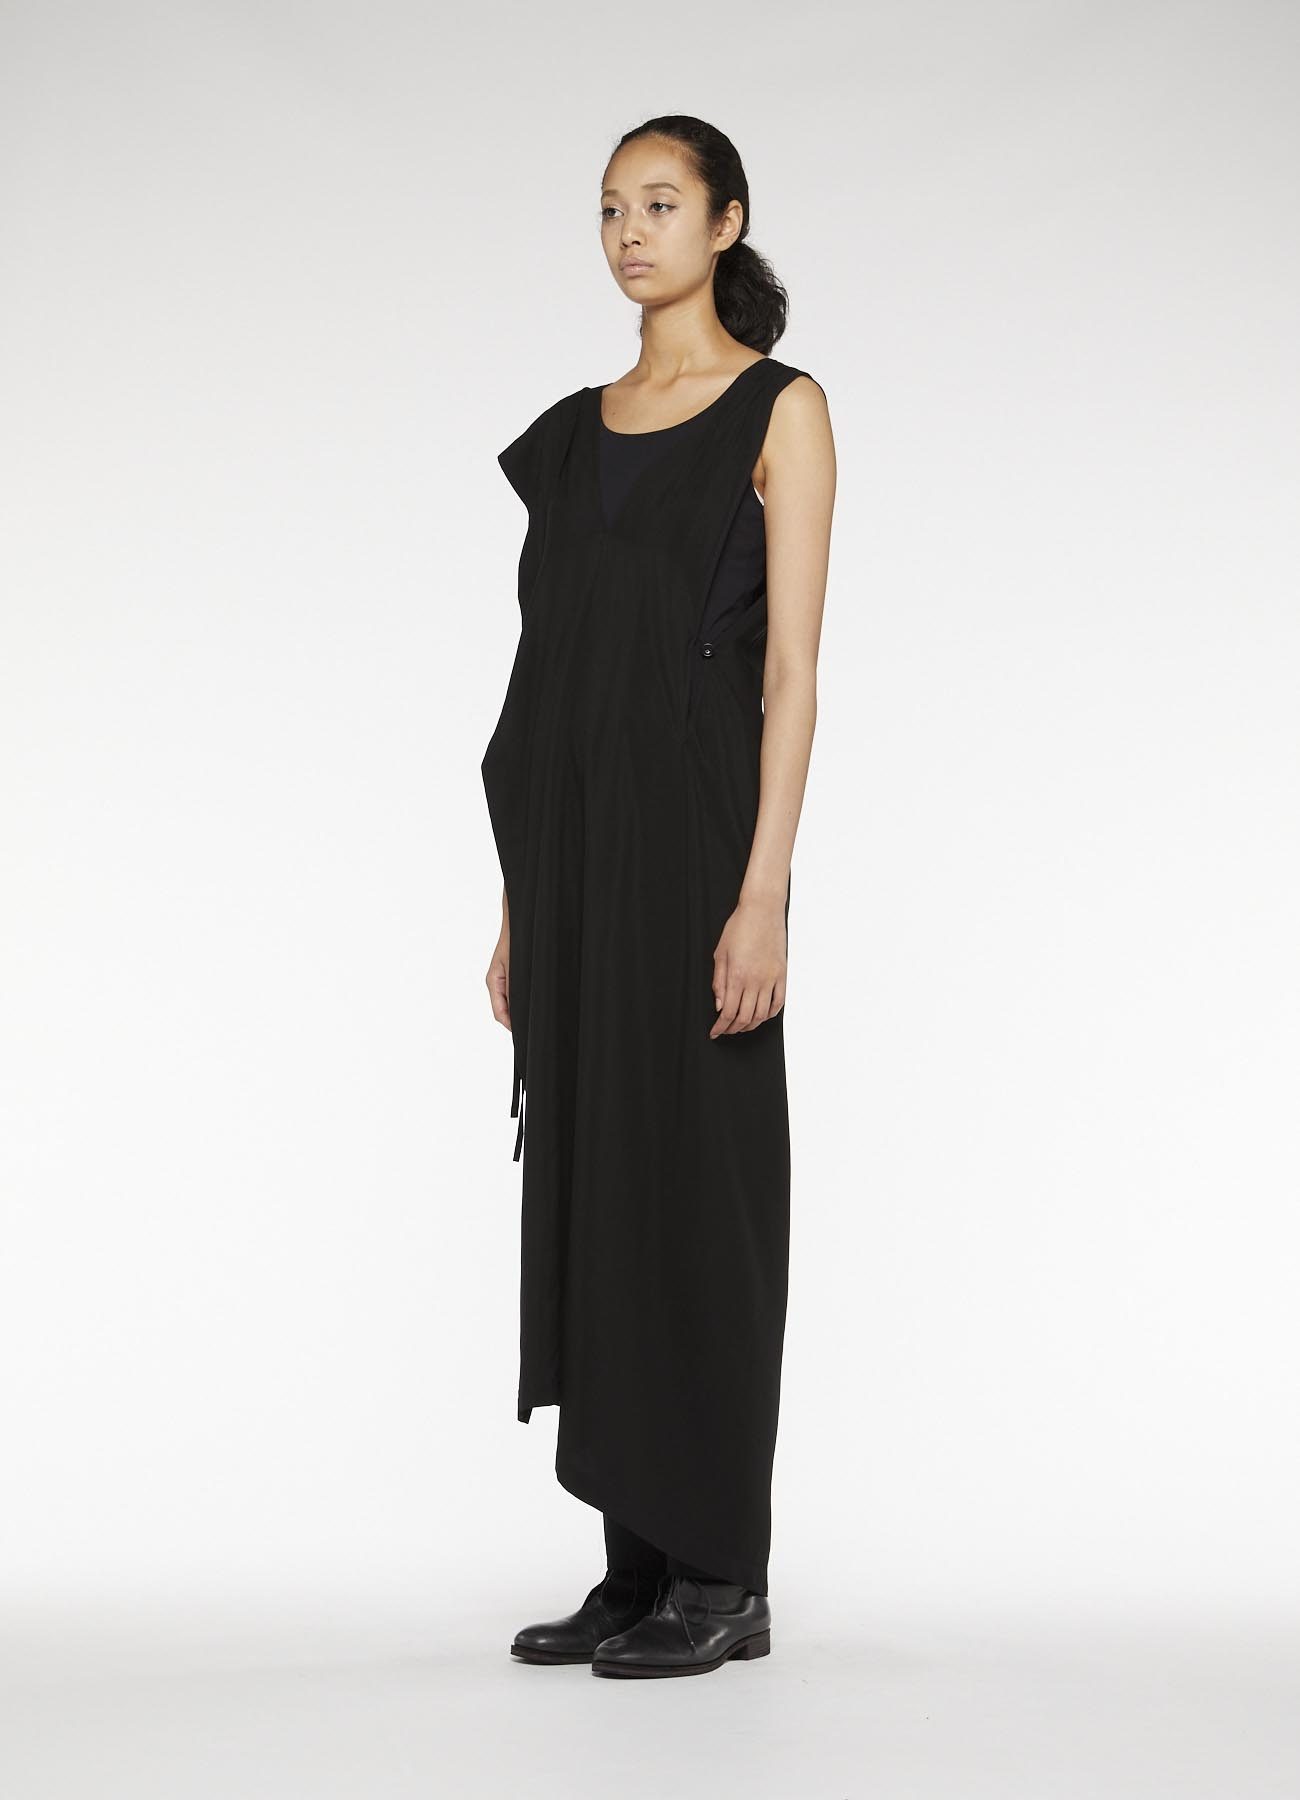 MICHIKObyY's RAYON CUPRA TUSSAH WRAP DRESS